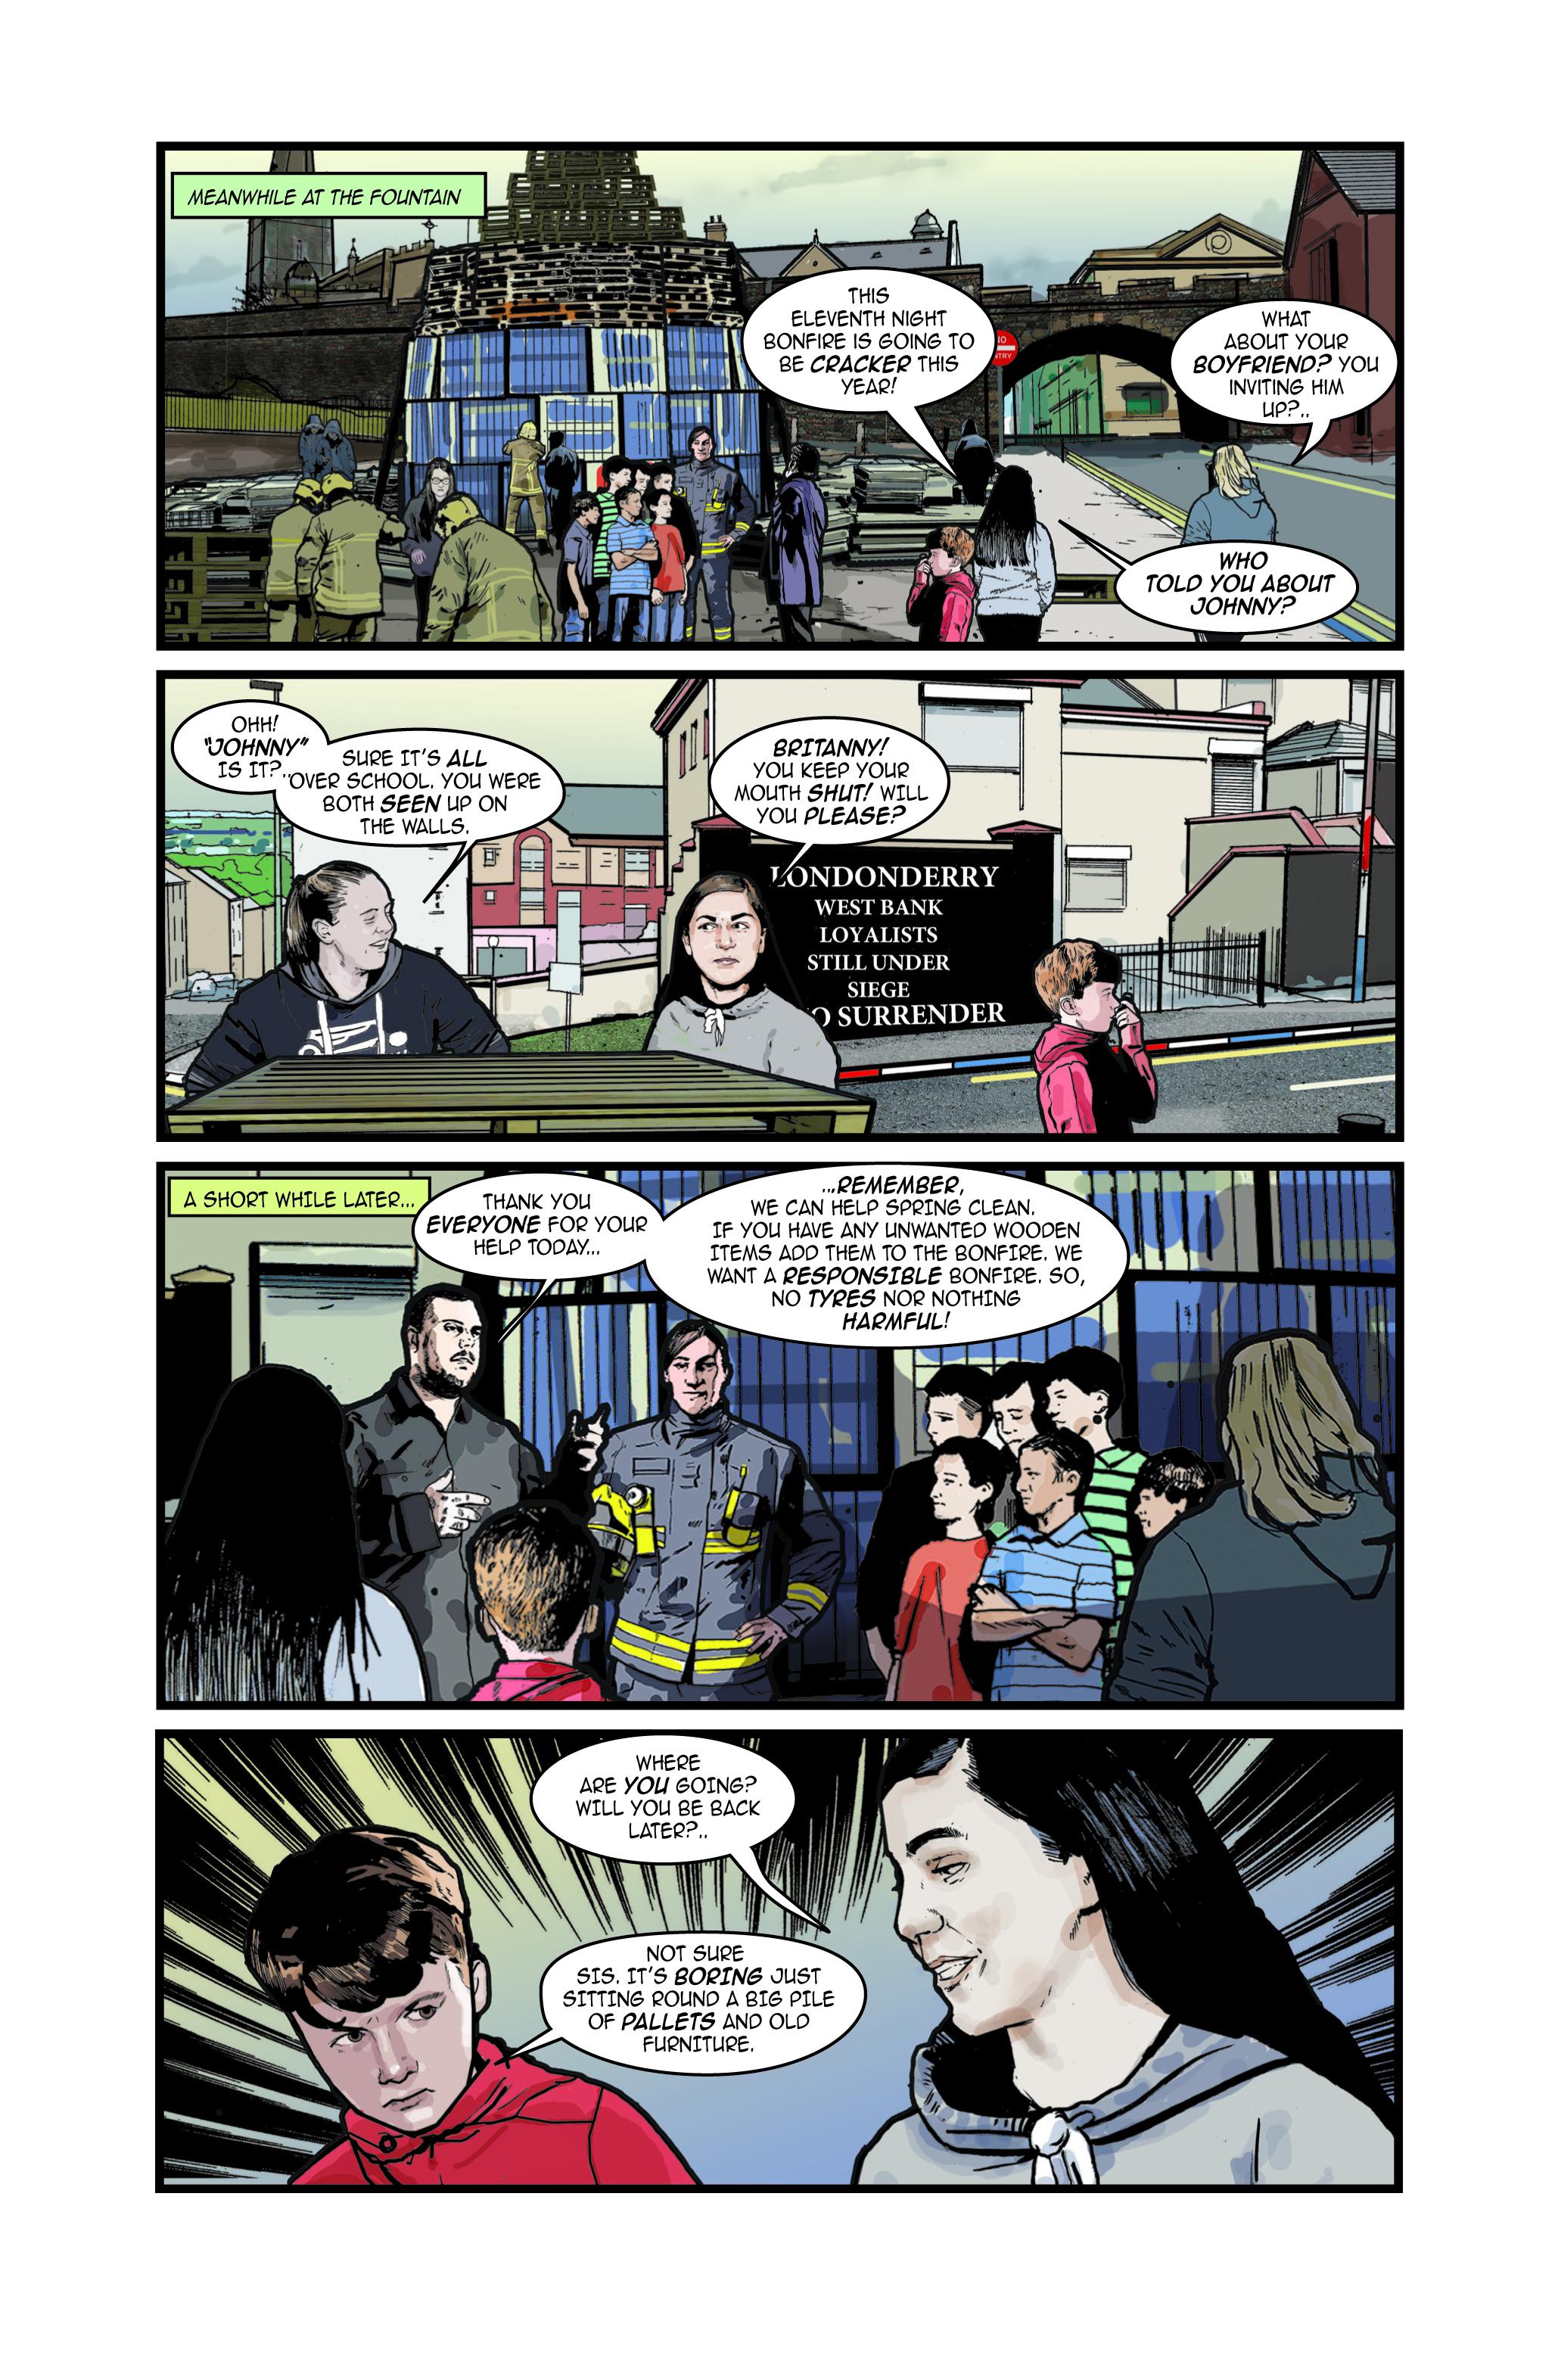 BURNING PAGE 7